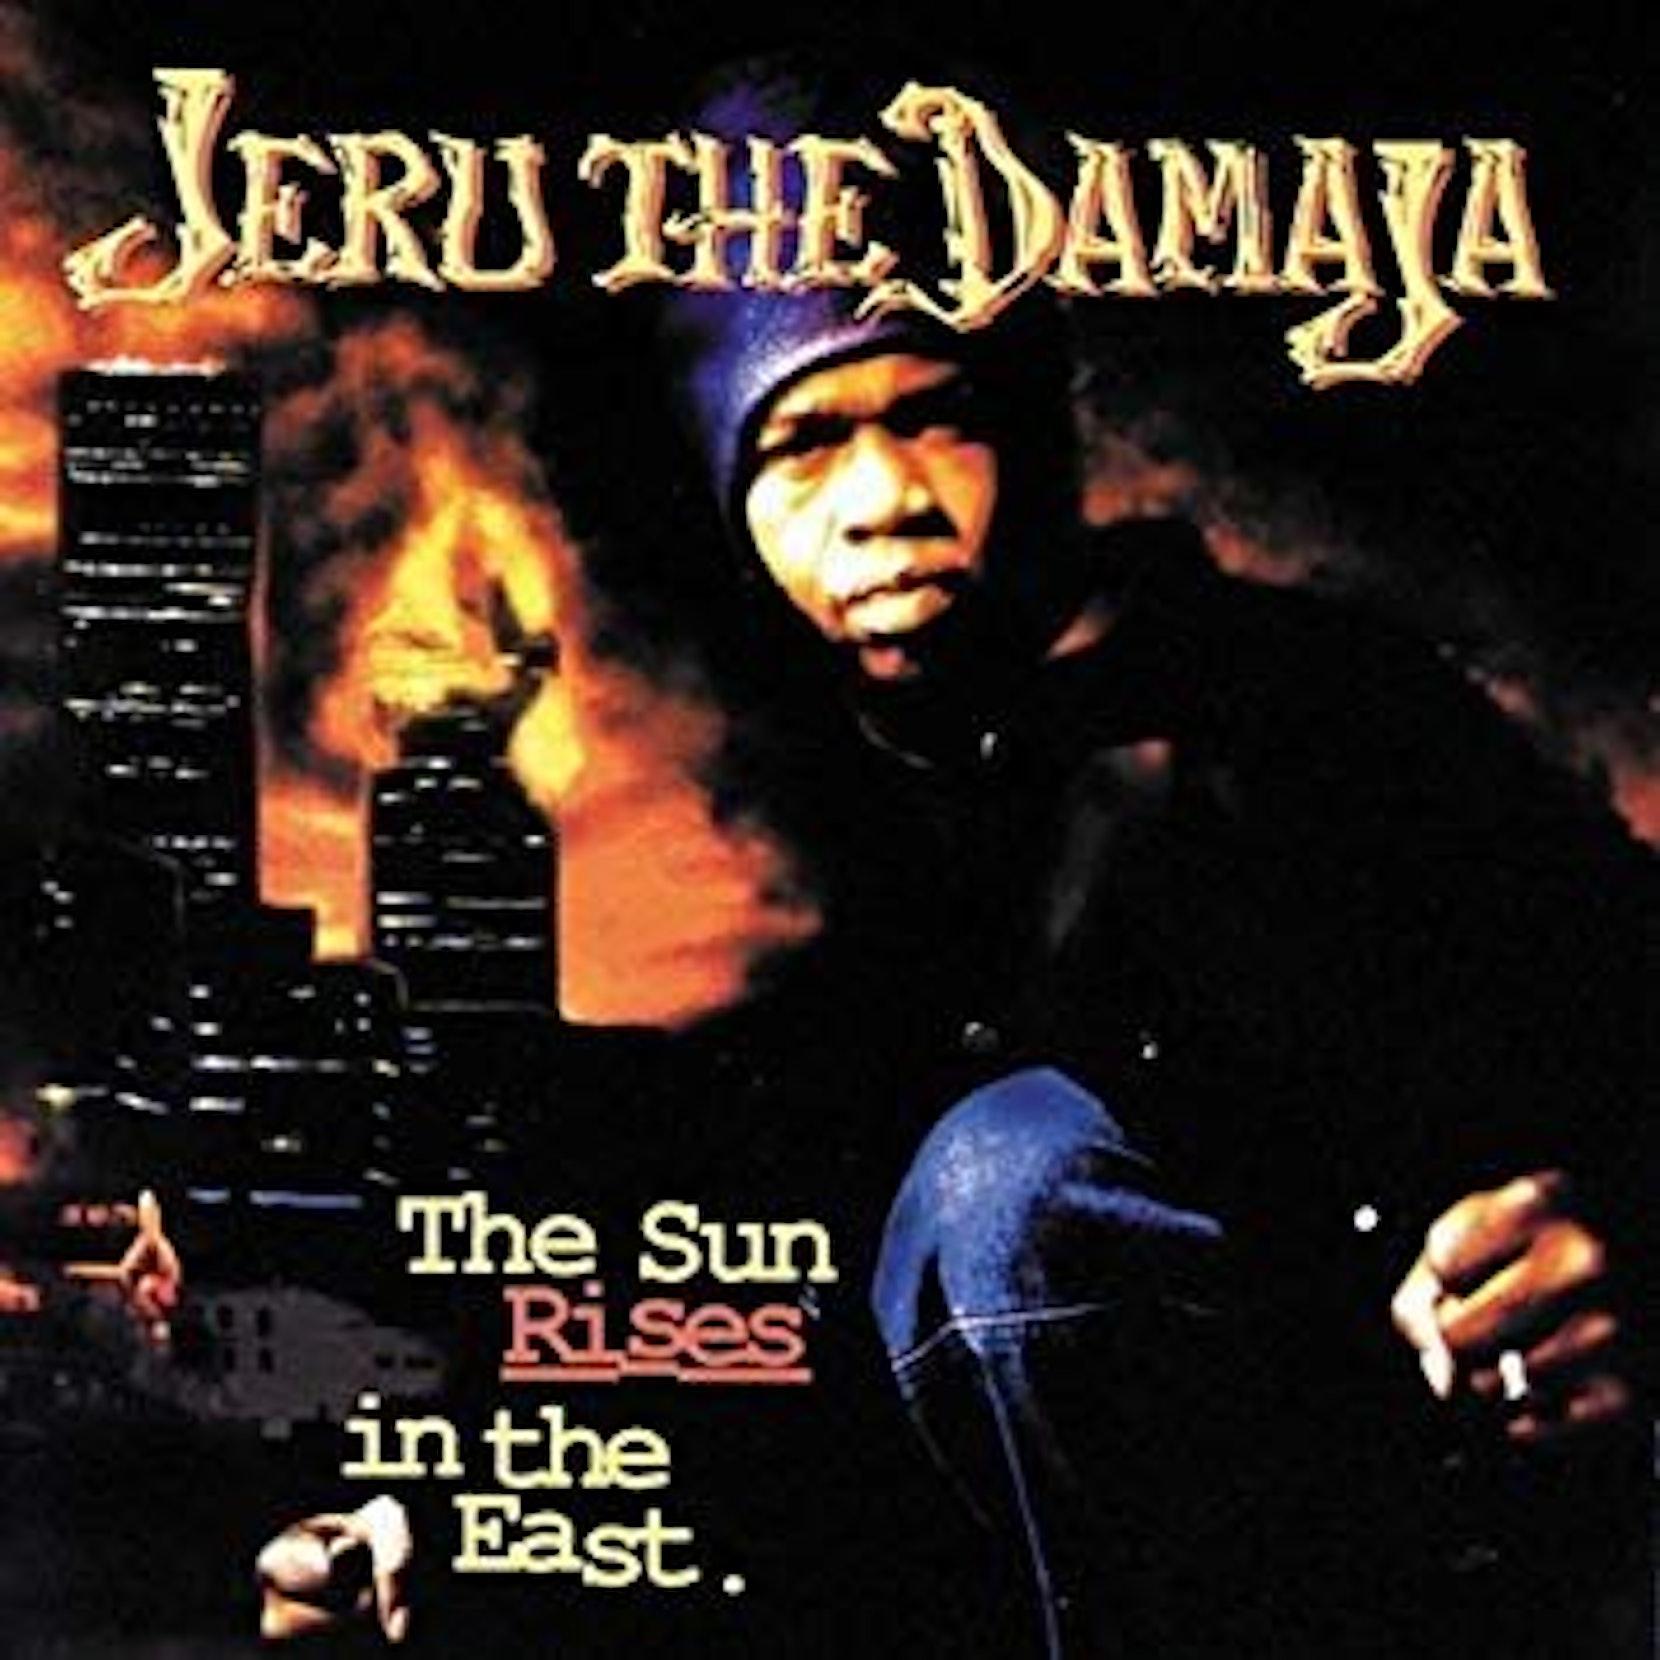 The 10 Best Jazz Rap Albums To Own On Vinyl — Vinyl Me, Please